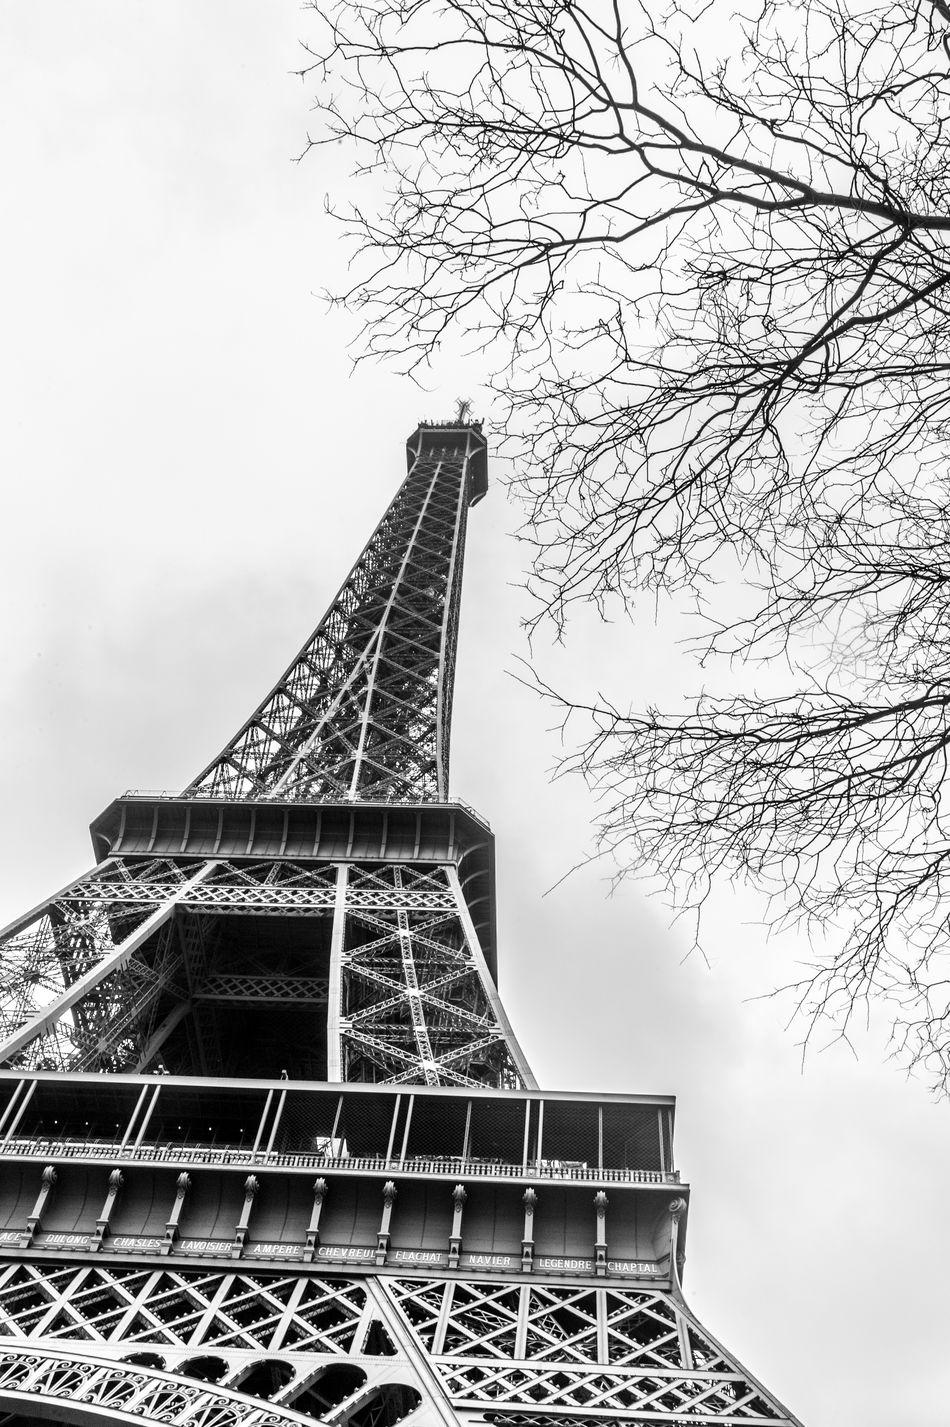 Paris 2014 LTV First Eyeem Photo Travel Photography Blackandwhite Paris ❤ Eiffel Tower Europapark